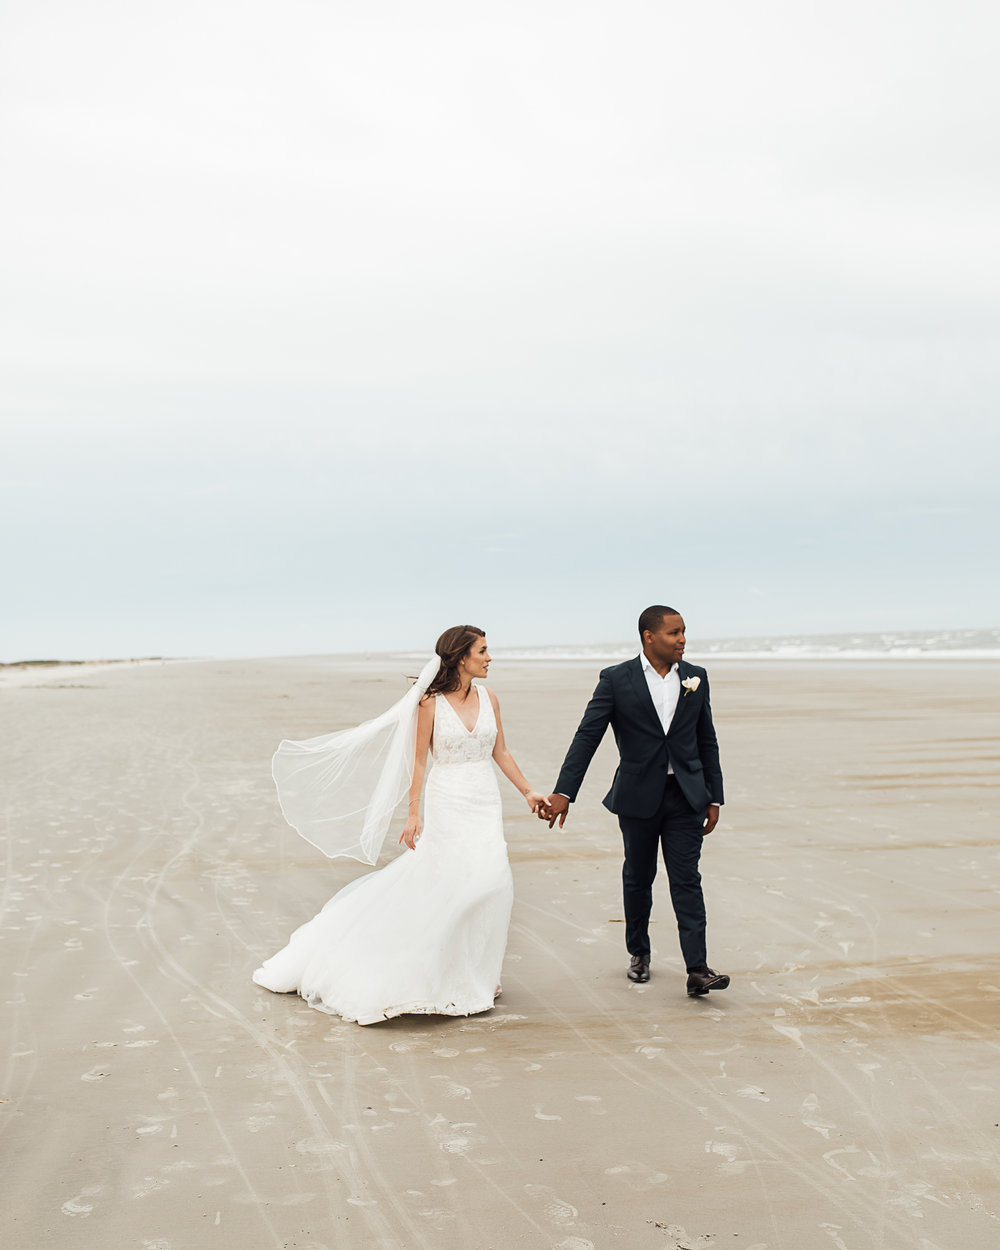 Fripp-Island-Resort-Beach-Wedding-Katie-and-Larry53.jpg